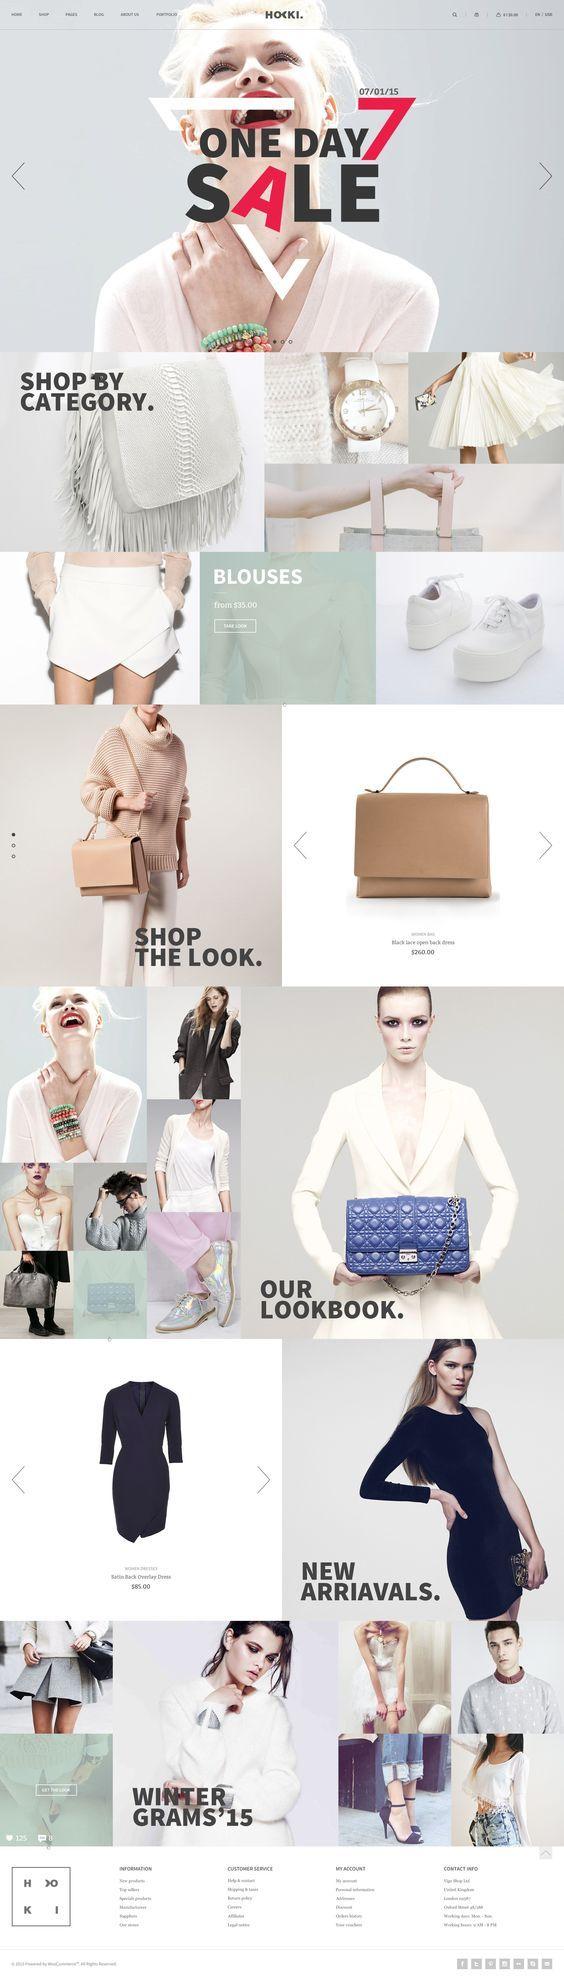 Hoki – eCommerce Template on Inspirationde: